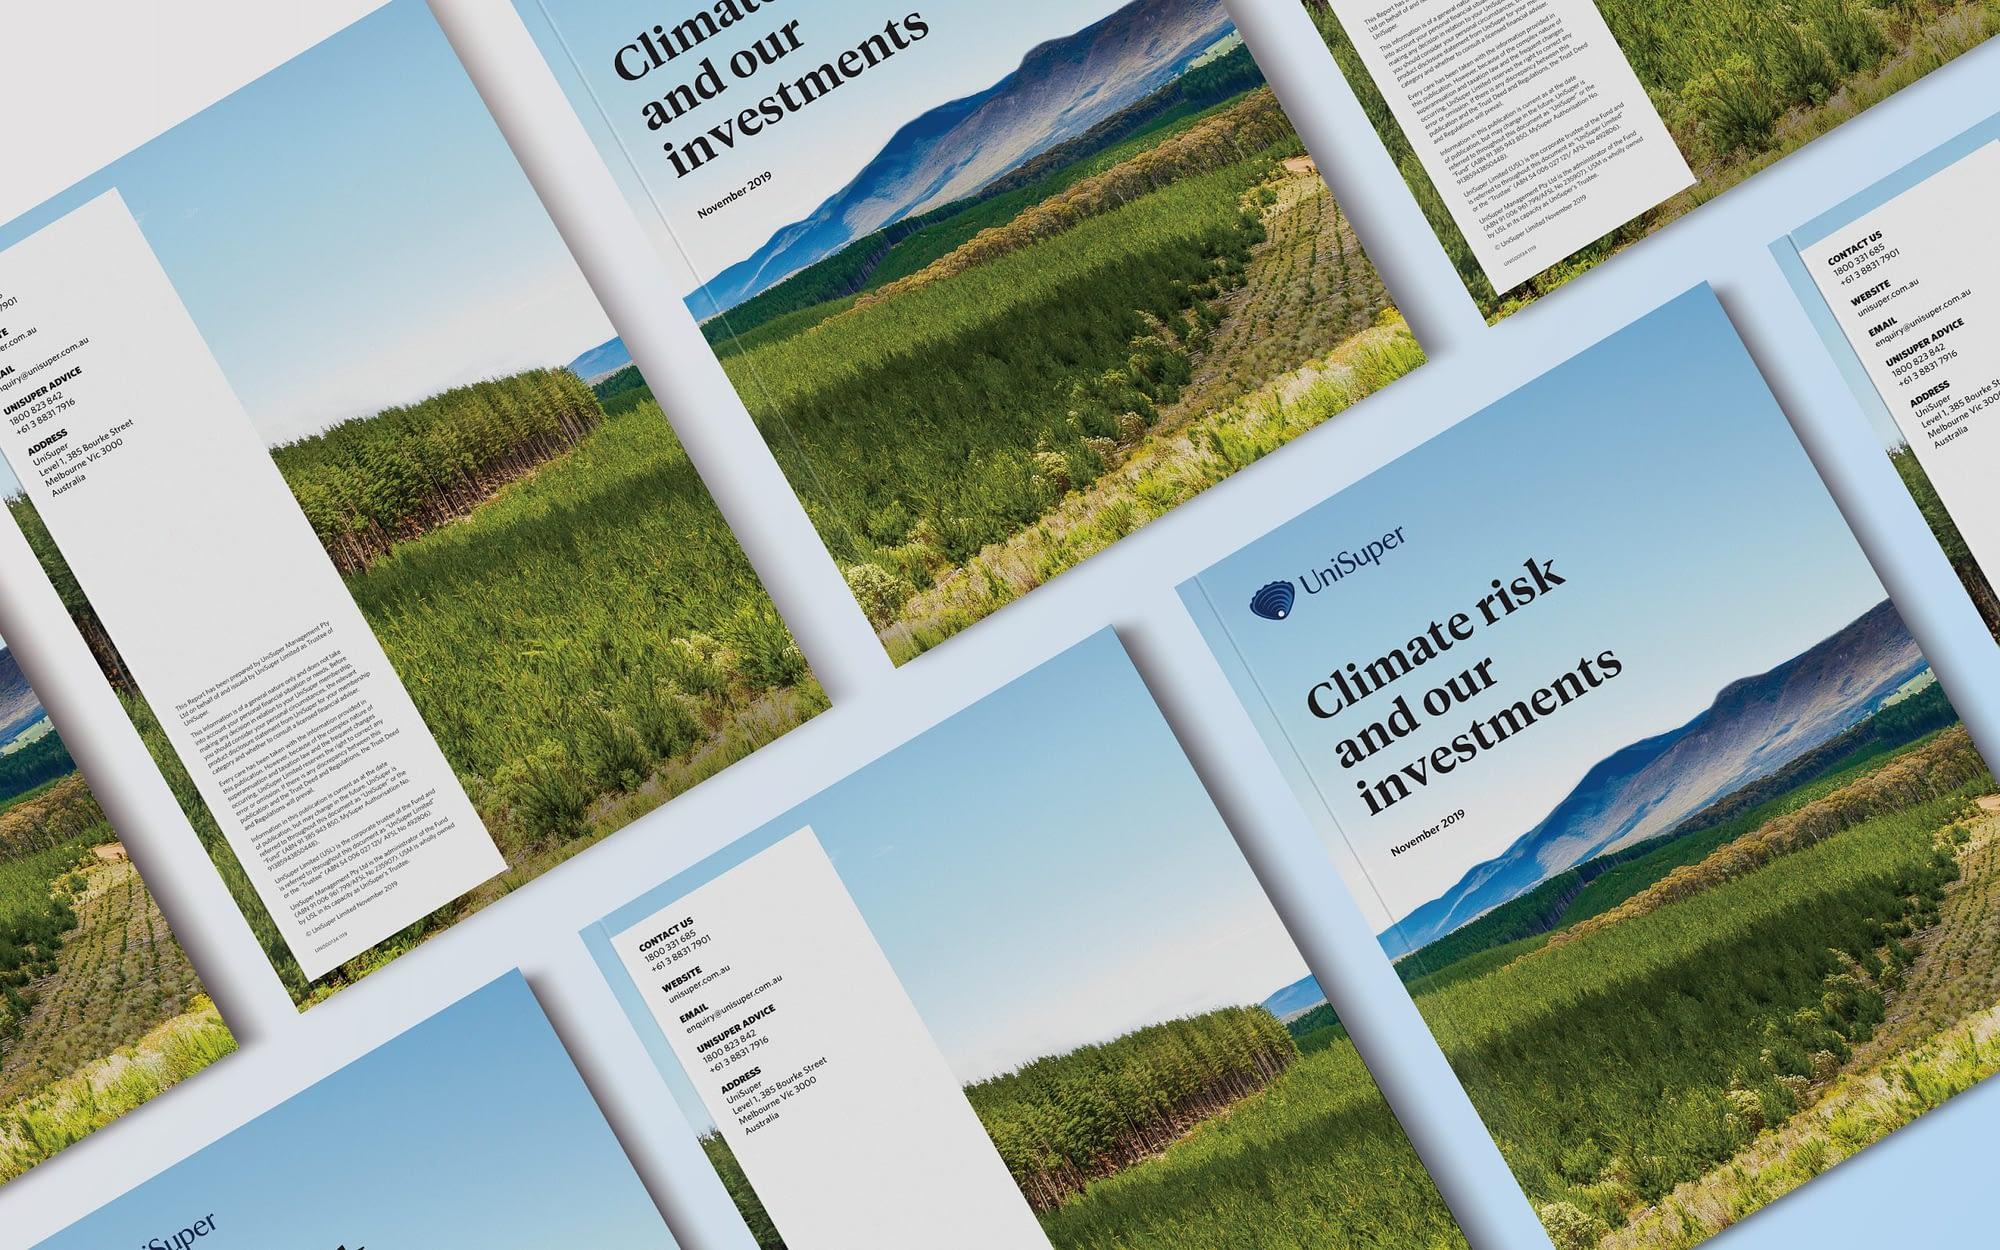 Unisuper 2019 Climate Risk report